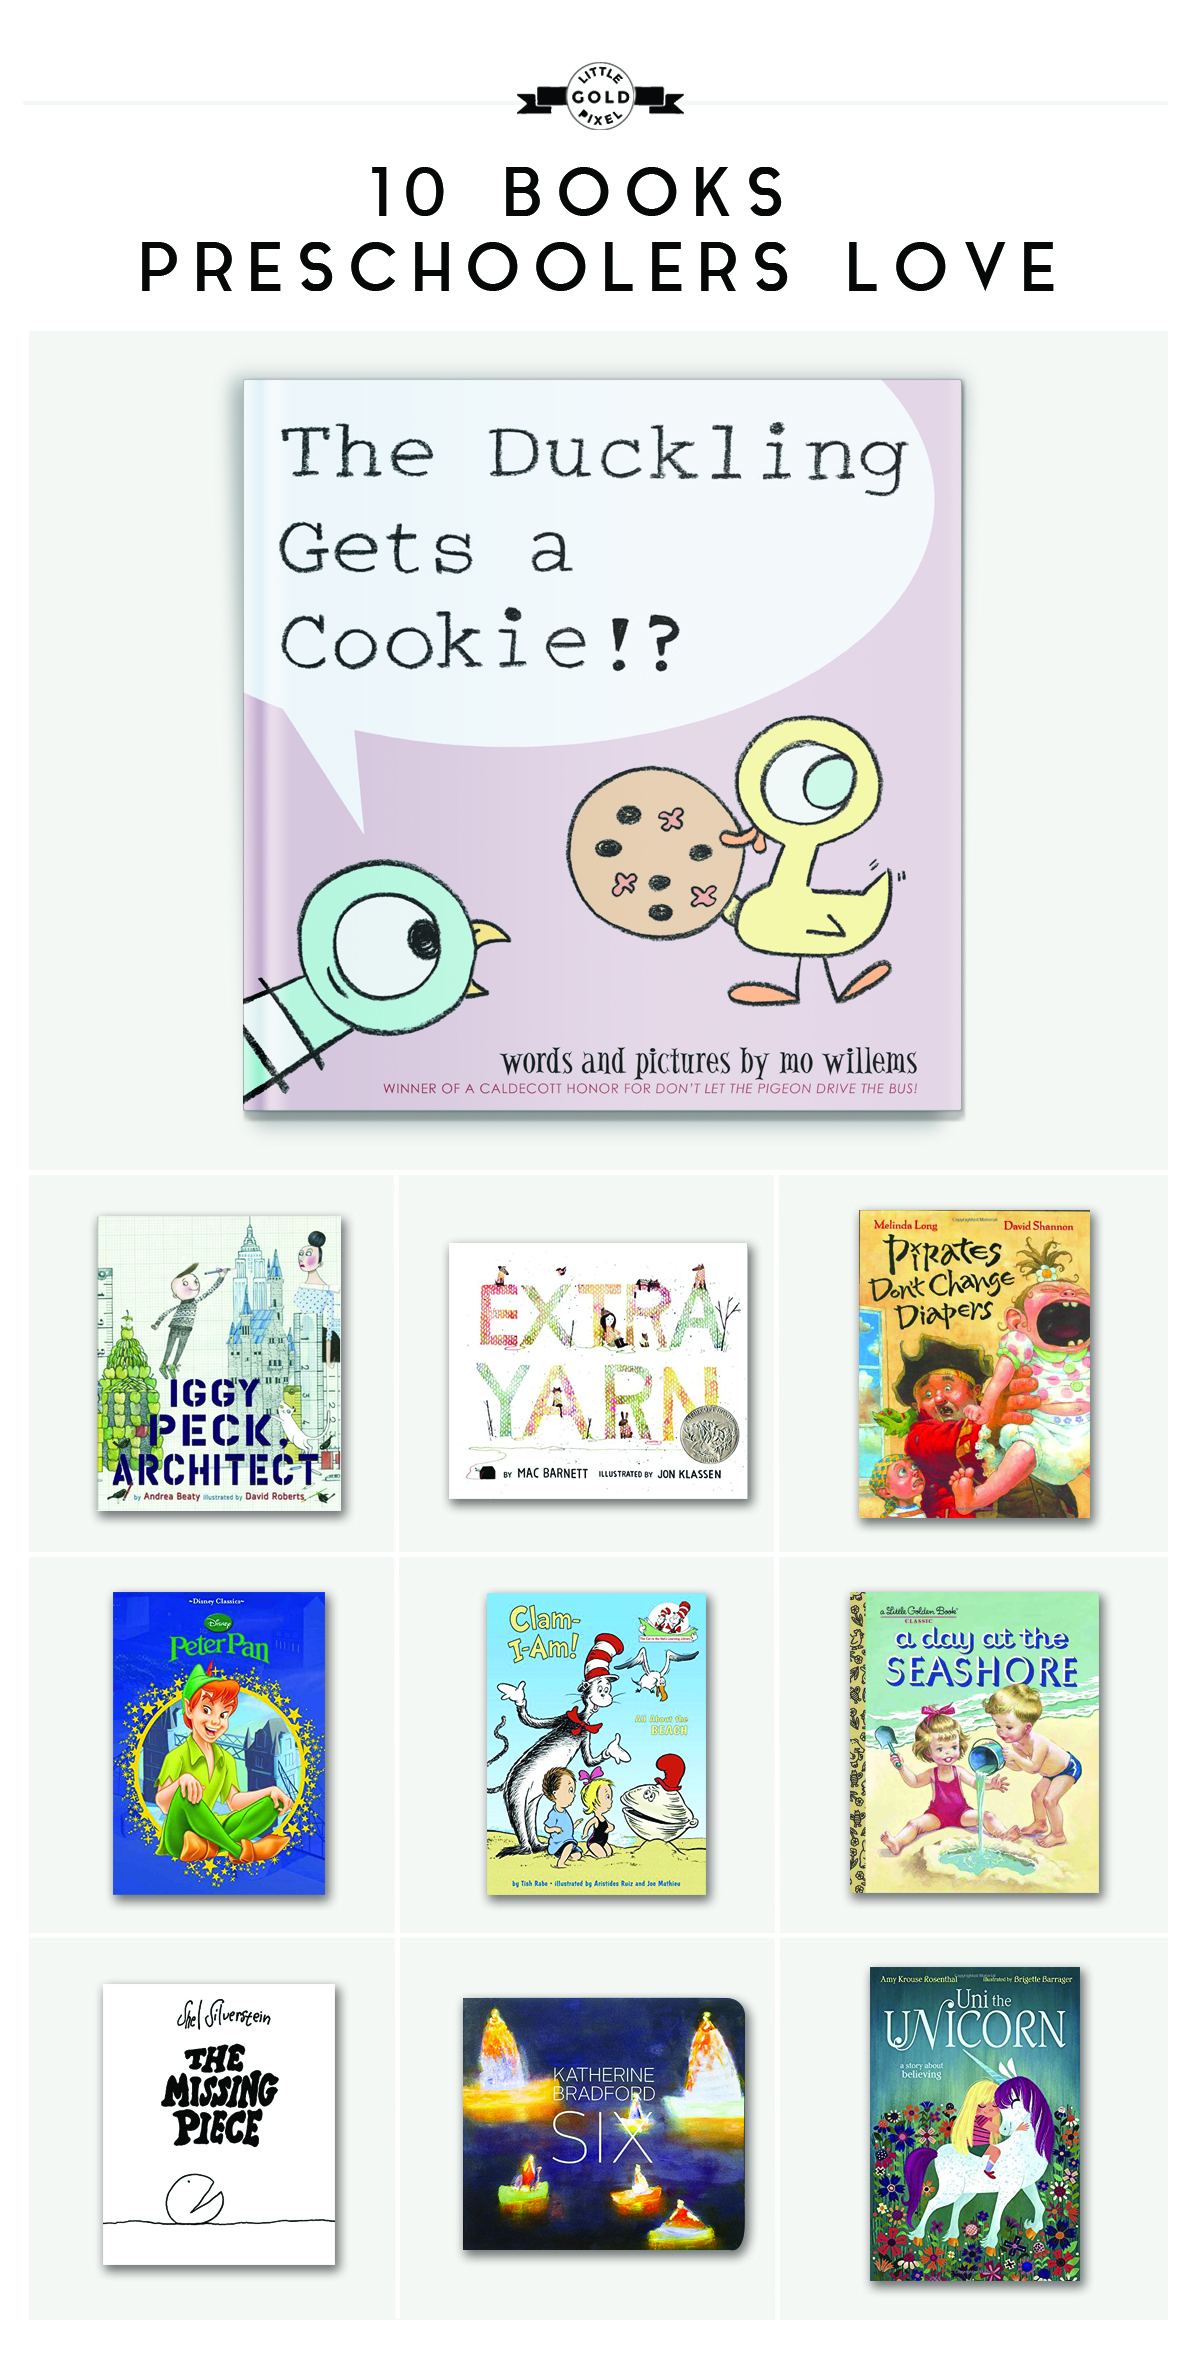 10-books-preschoolers-love